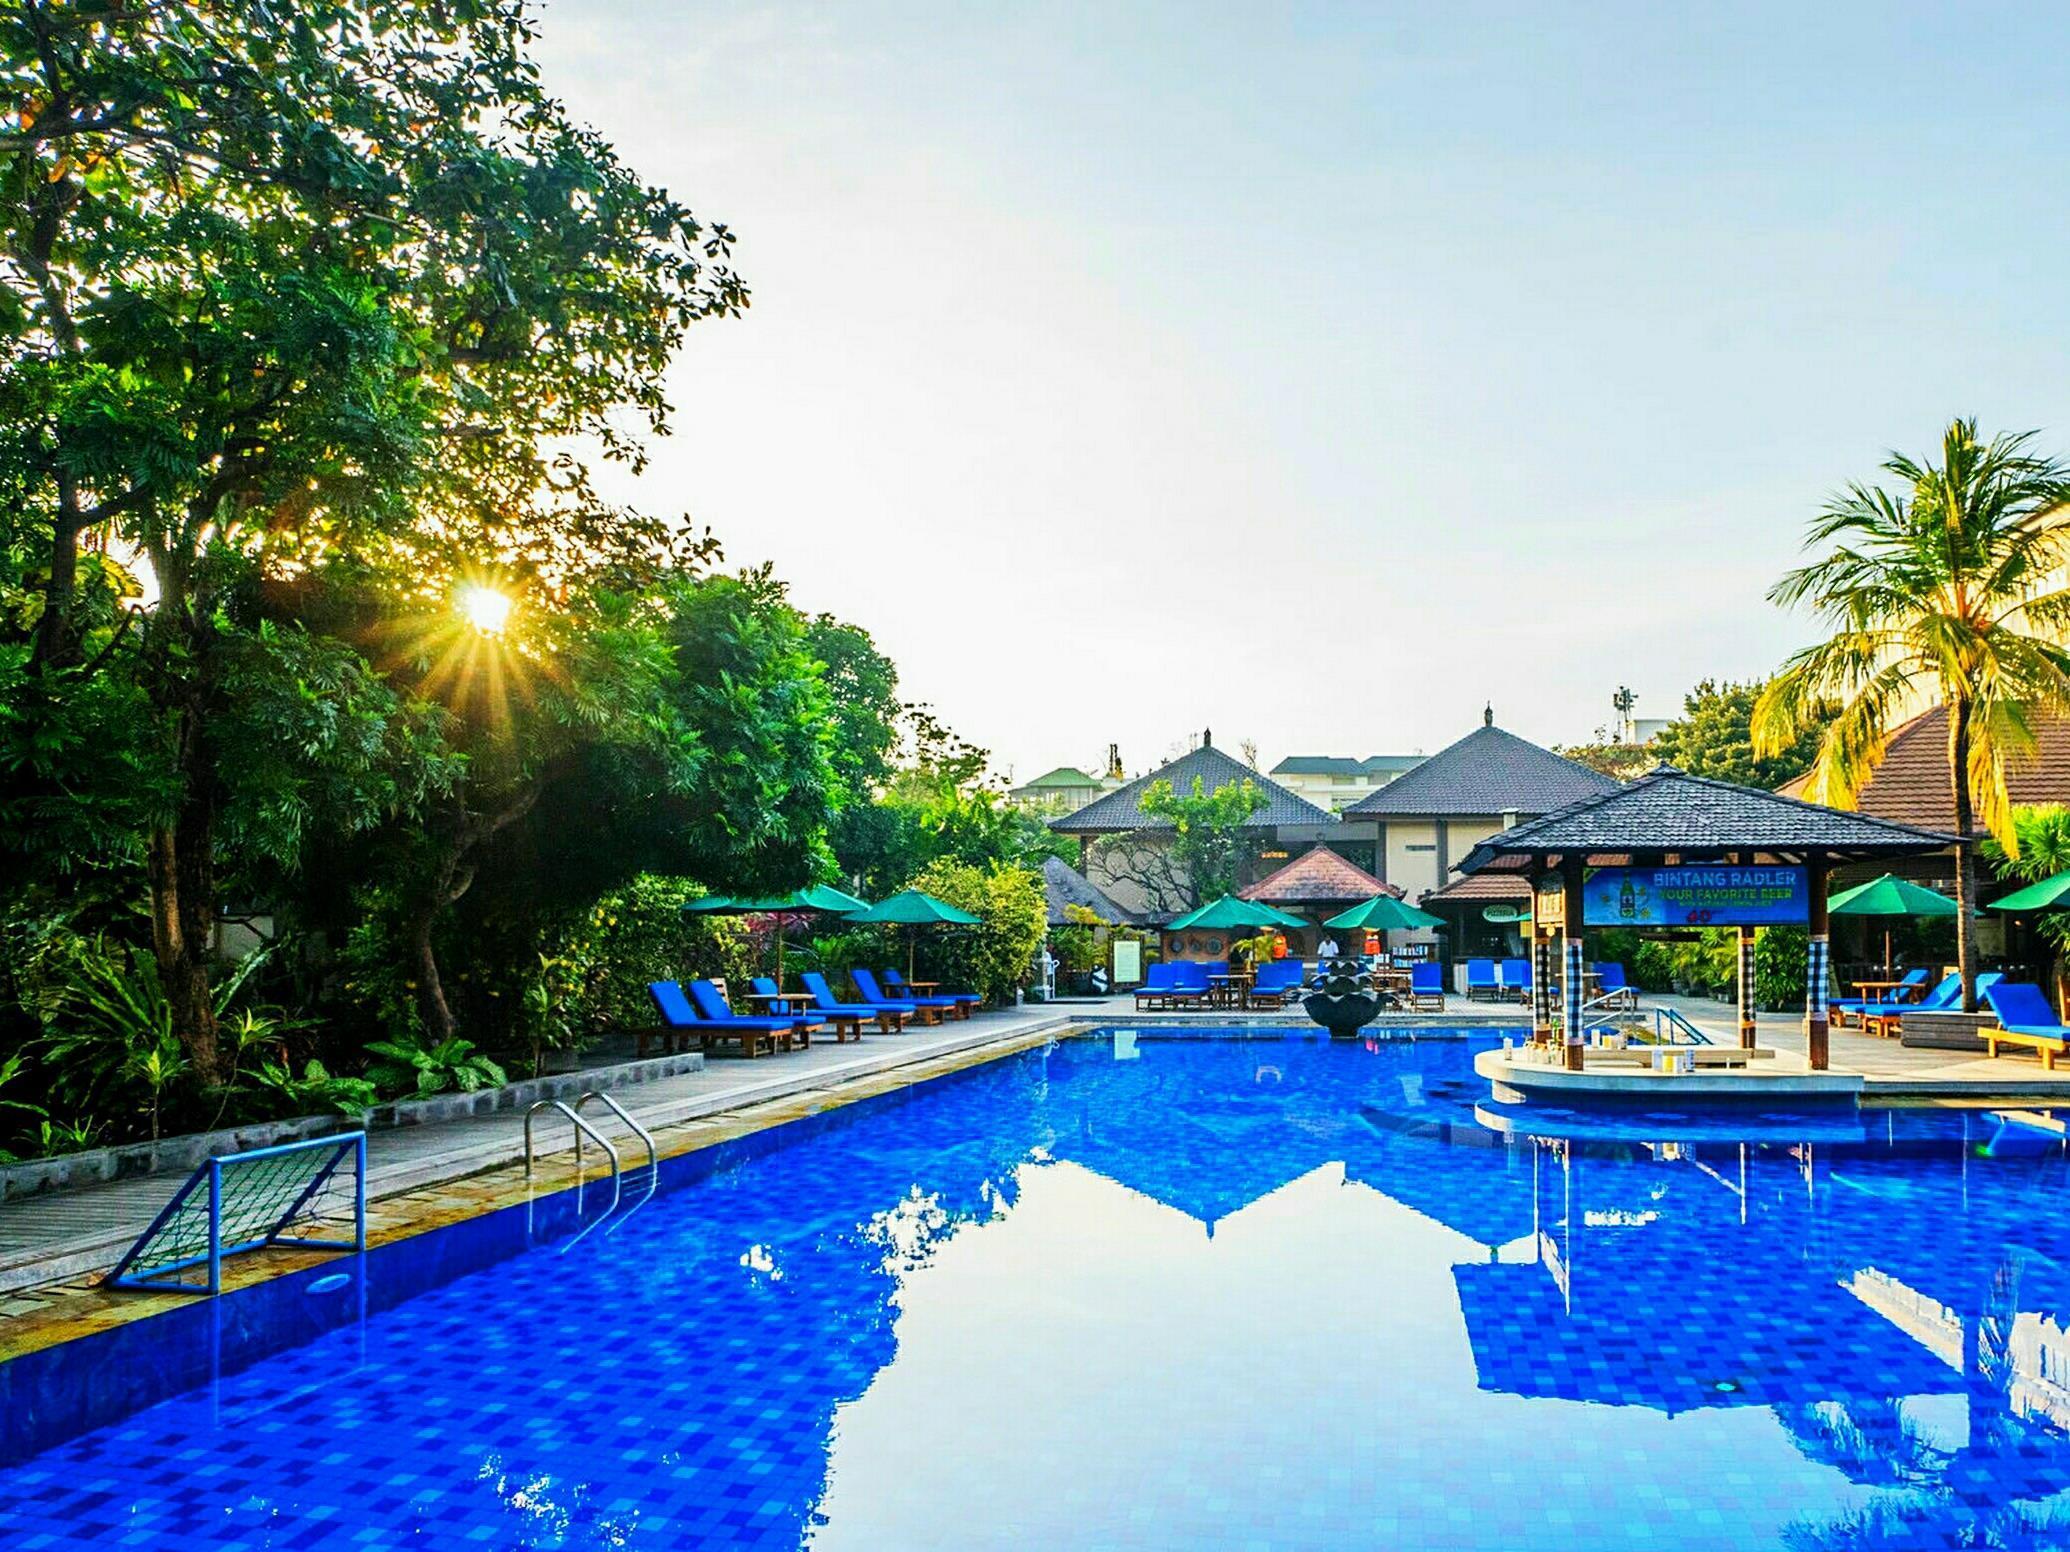 Risata Bali Resort & Spa ホテル詳細